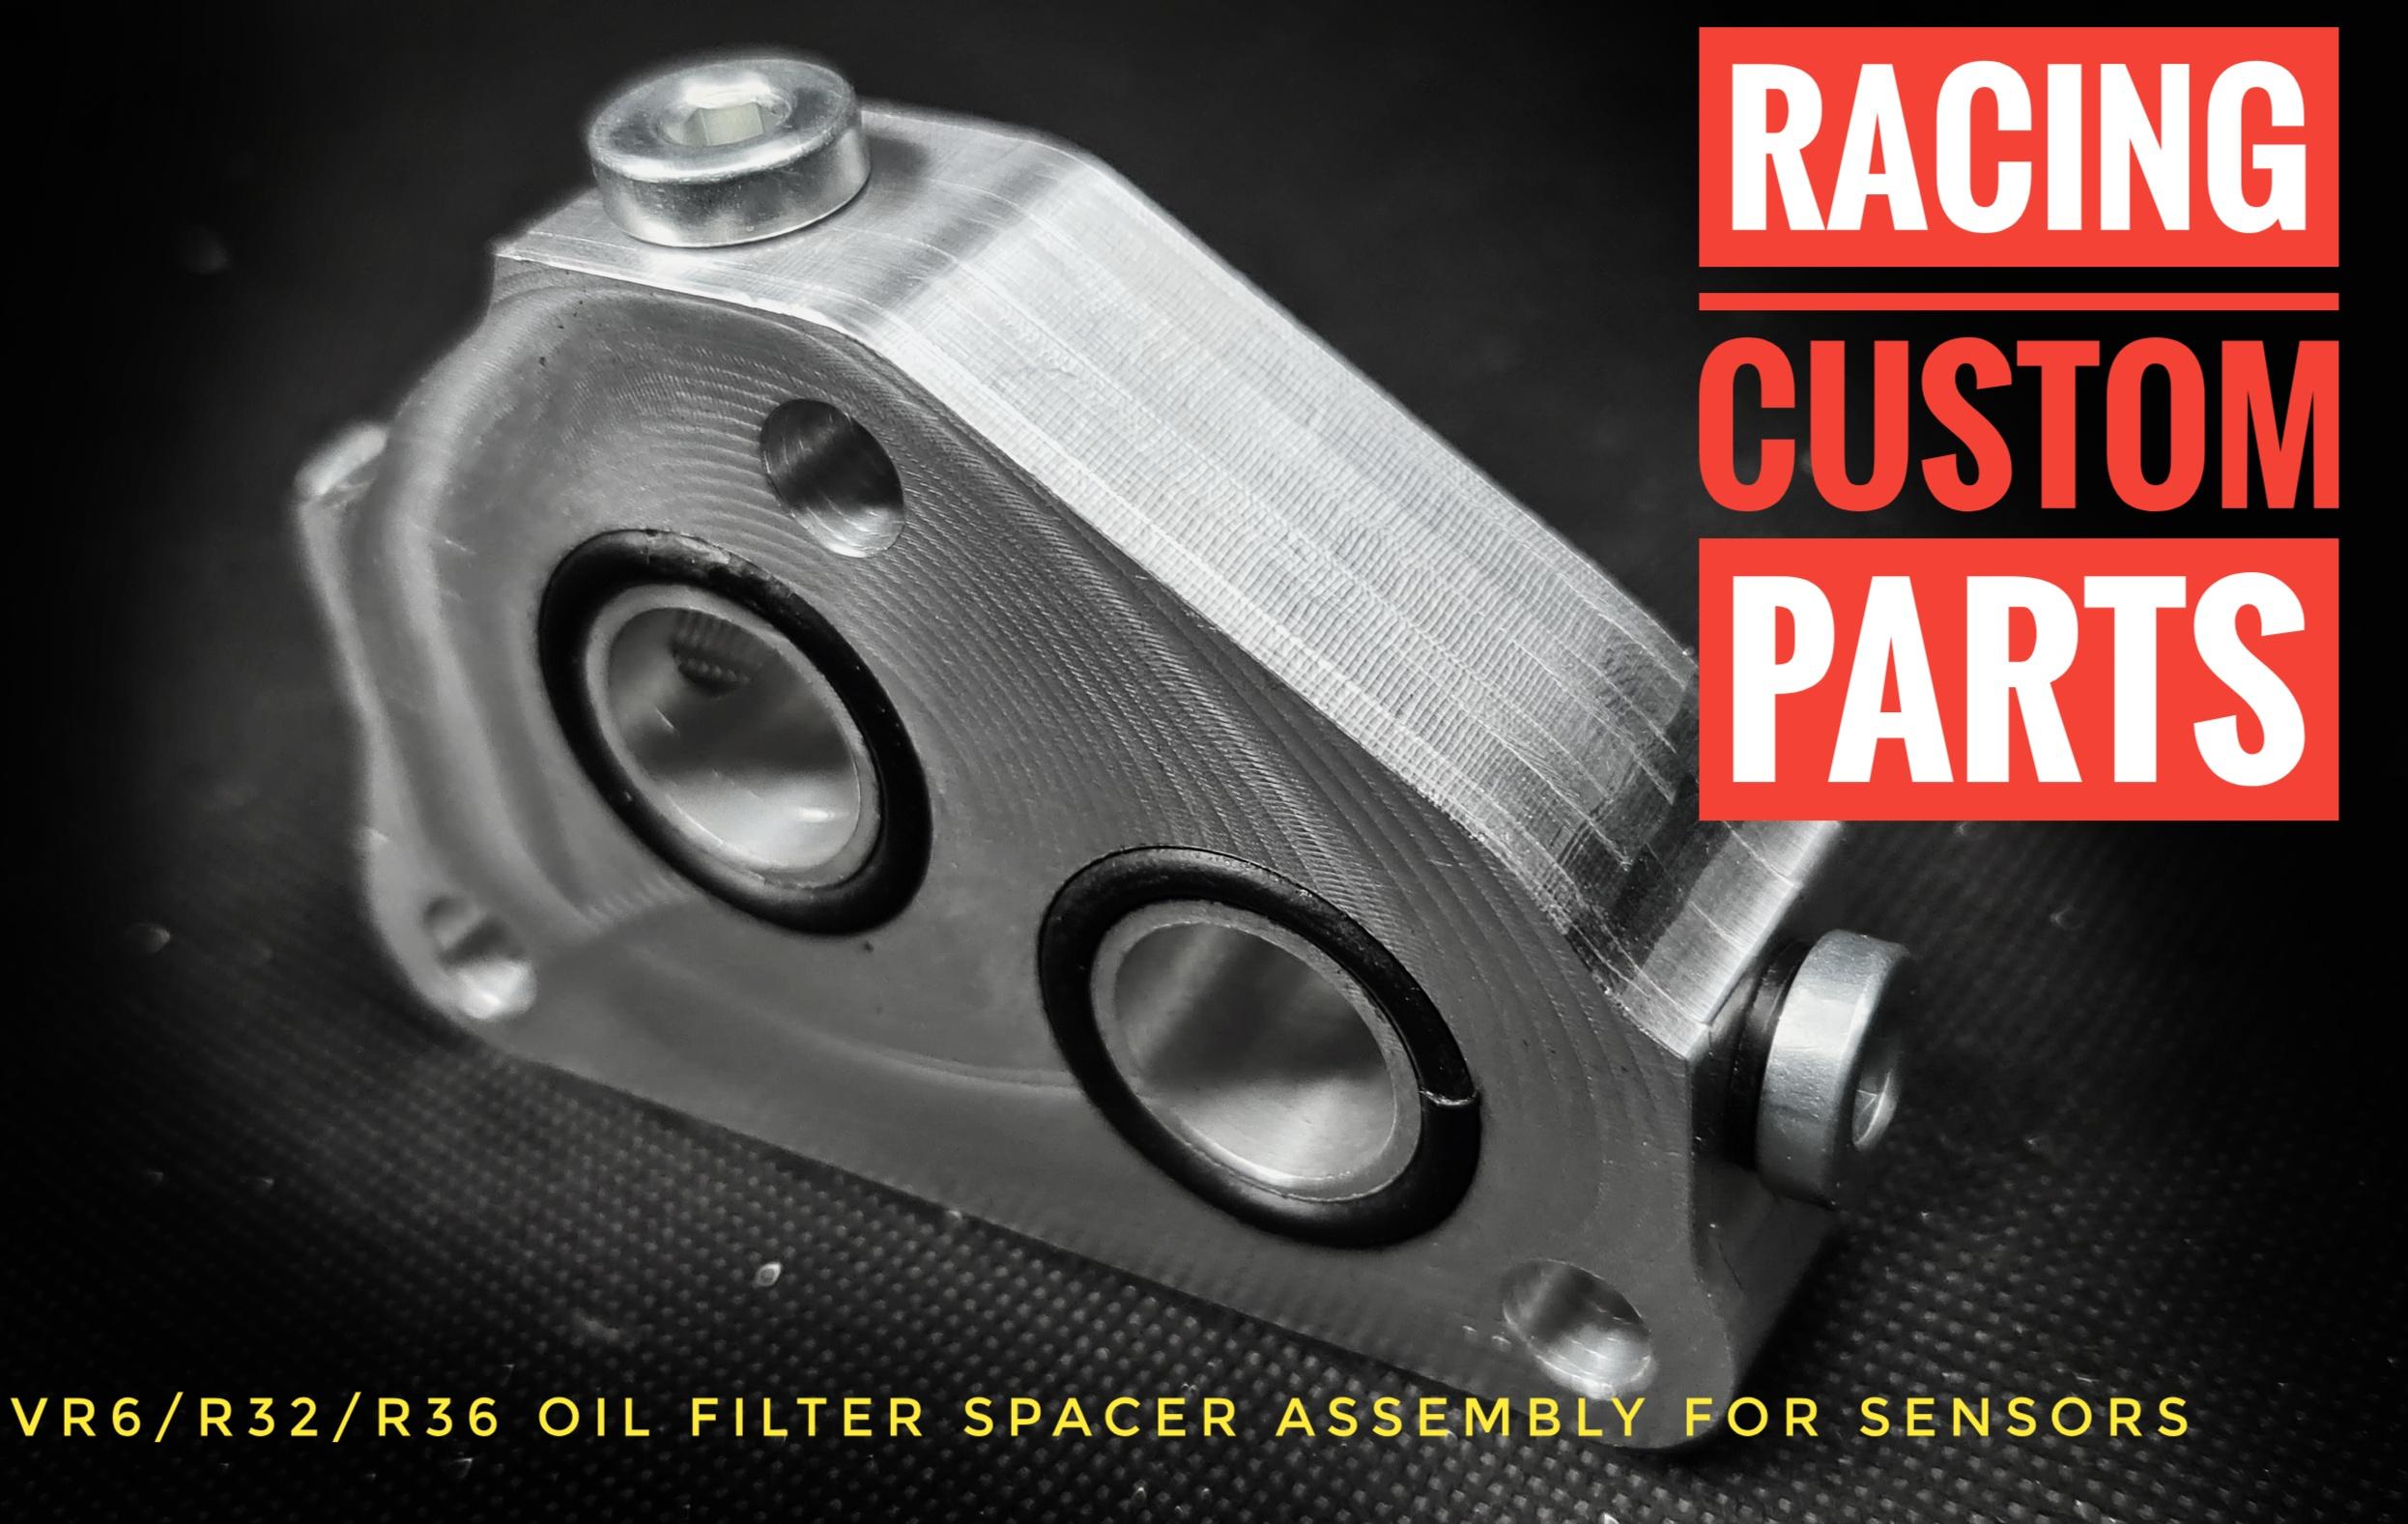 vr6 r32 r36 oil spacer assembly for sensors turbo billet cnc racing custom parts